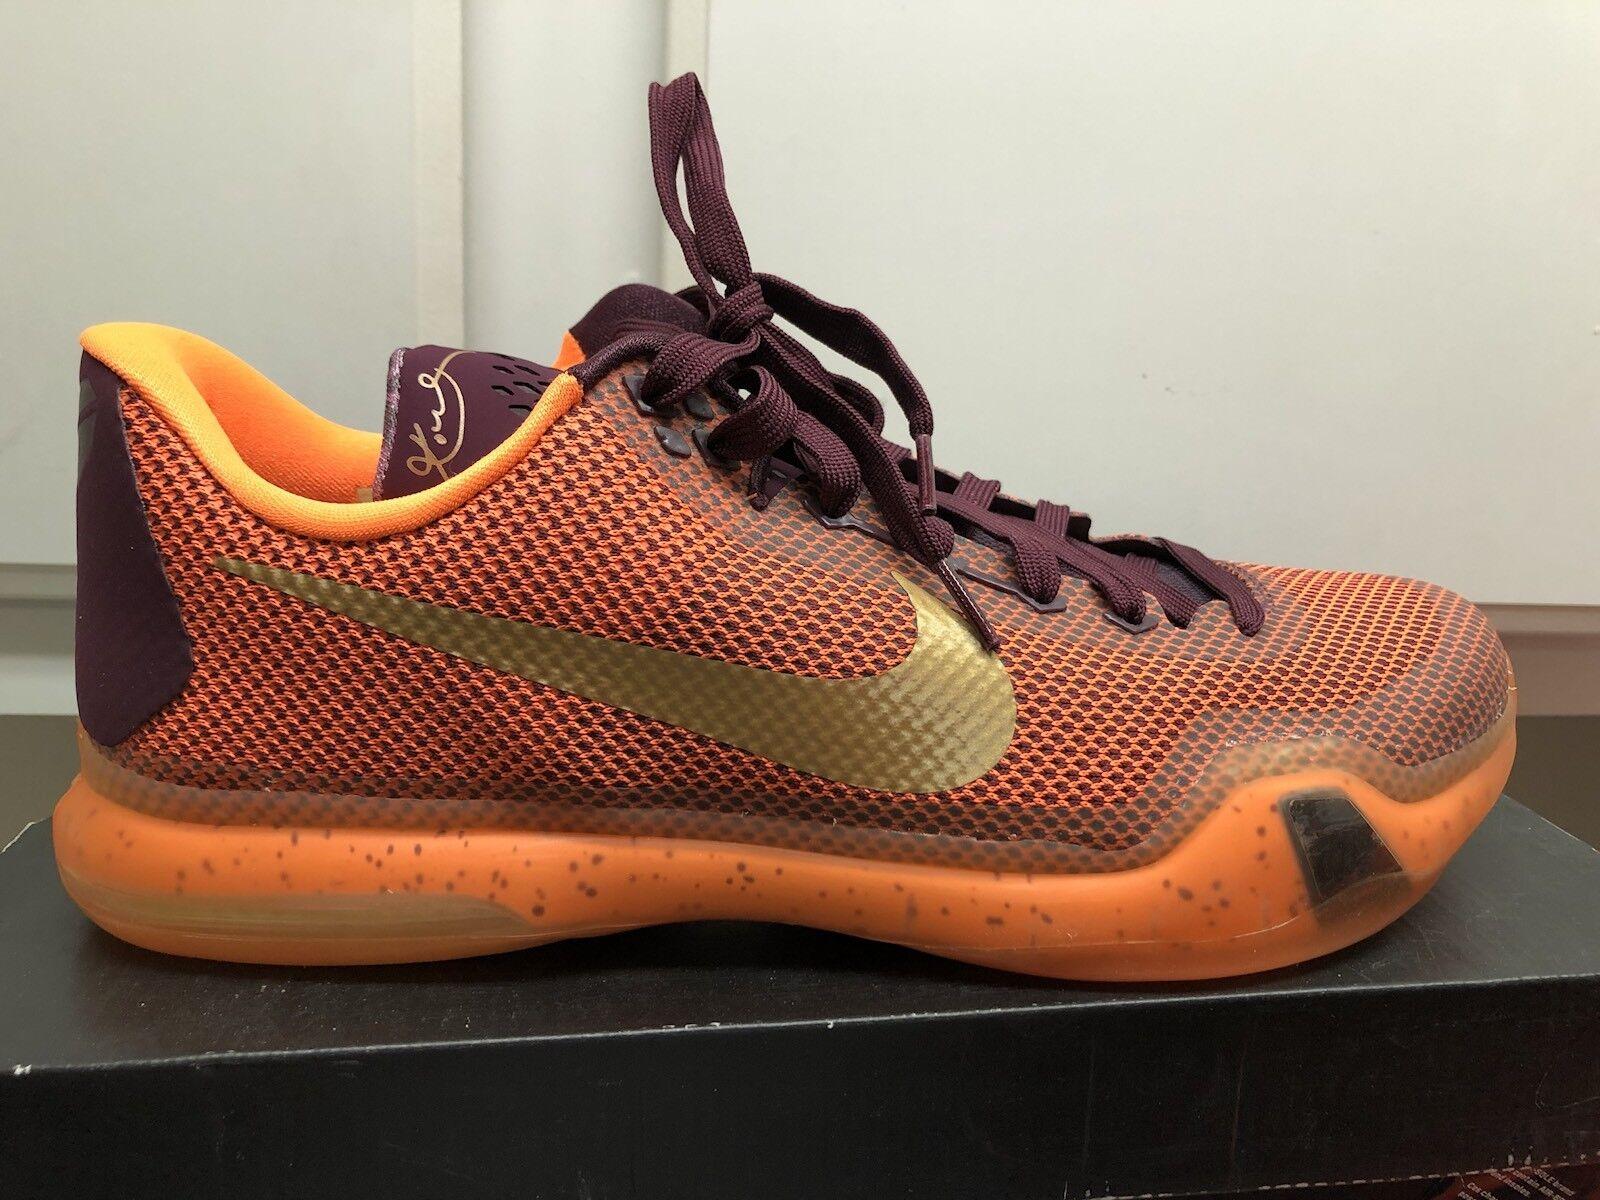 Nike Kobe 10 Silk Retro Predro 1,2,3,4,5,6,7,8,9,11 1,2,3,4,5,6,7,8,9,11 1,2,3,4,5,6,7,8,9,11 Jordan cddd72